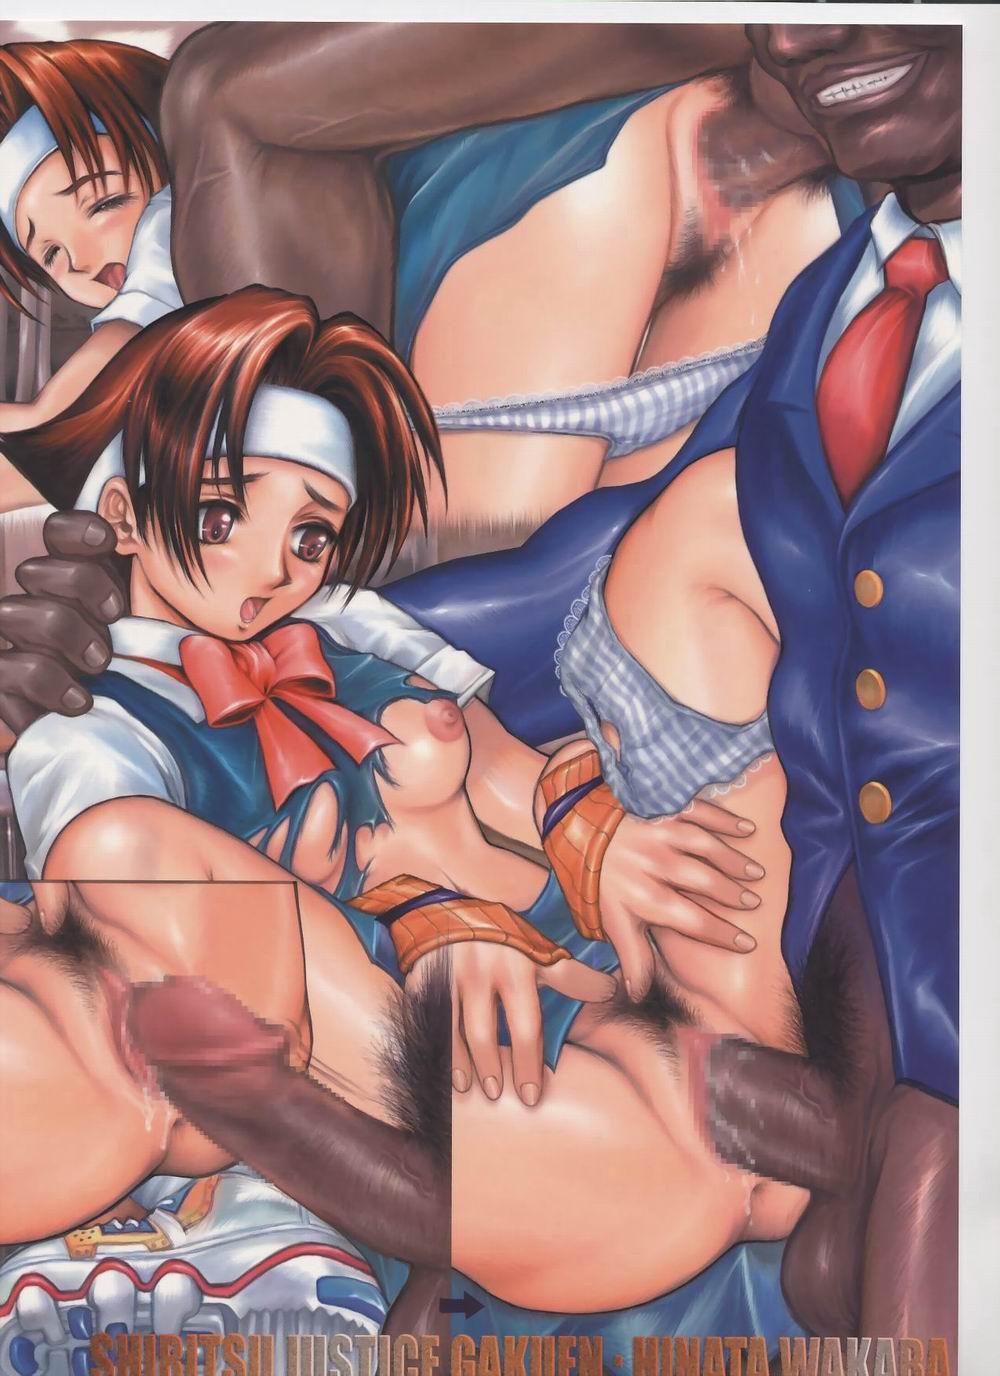 Danger Zone Files All Ero² Capcom 8